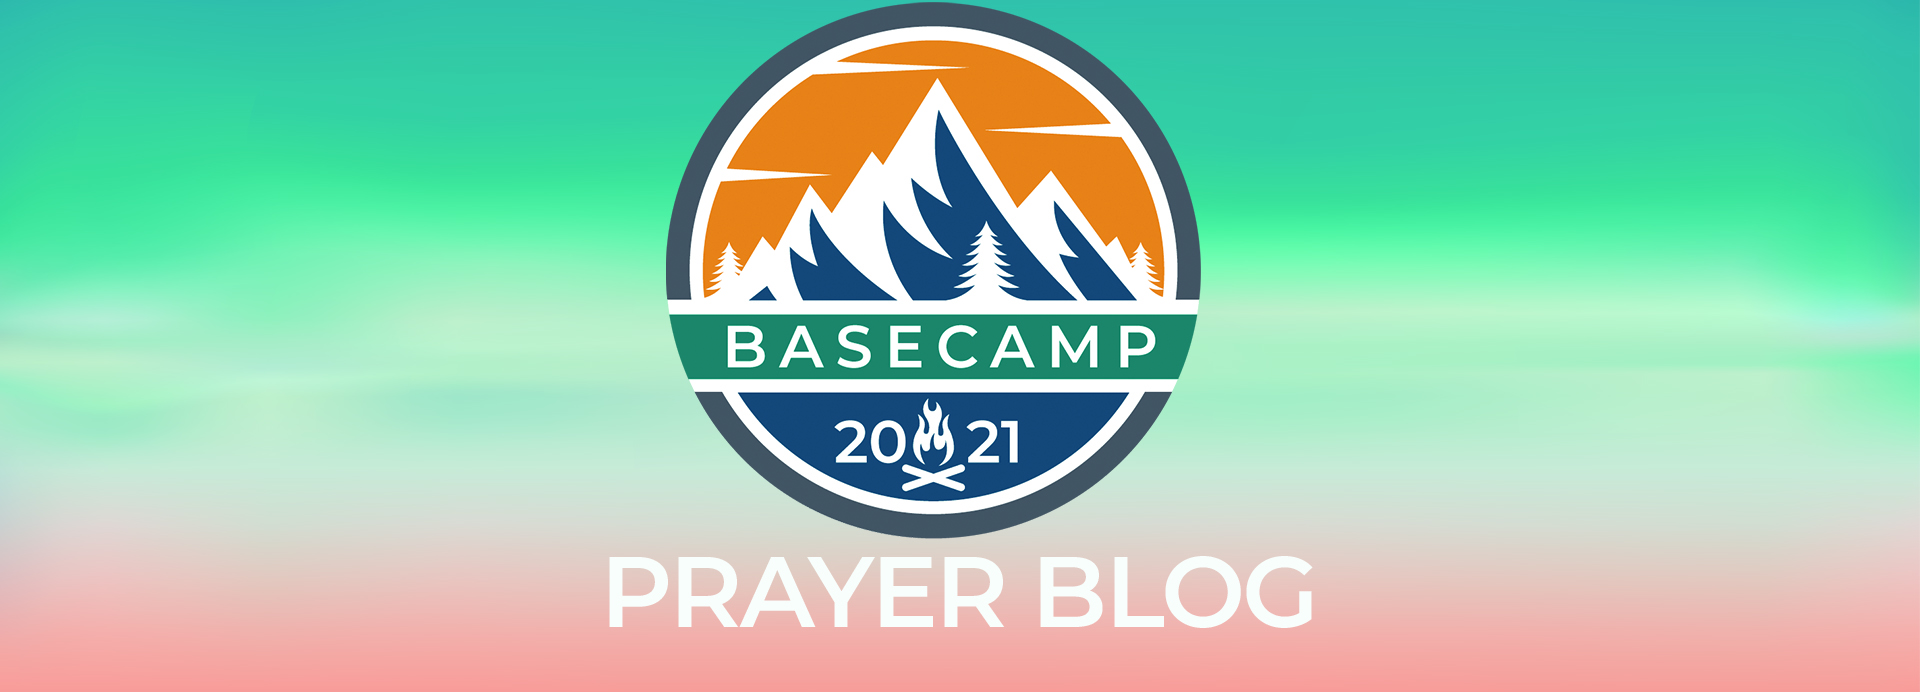 Prayer Campaign App Image Banner